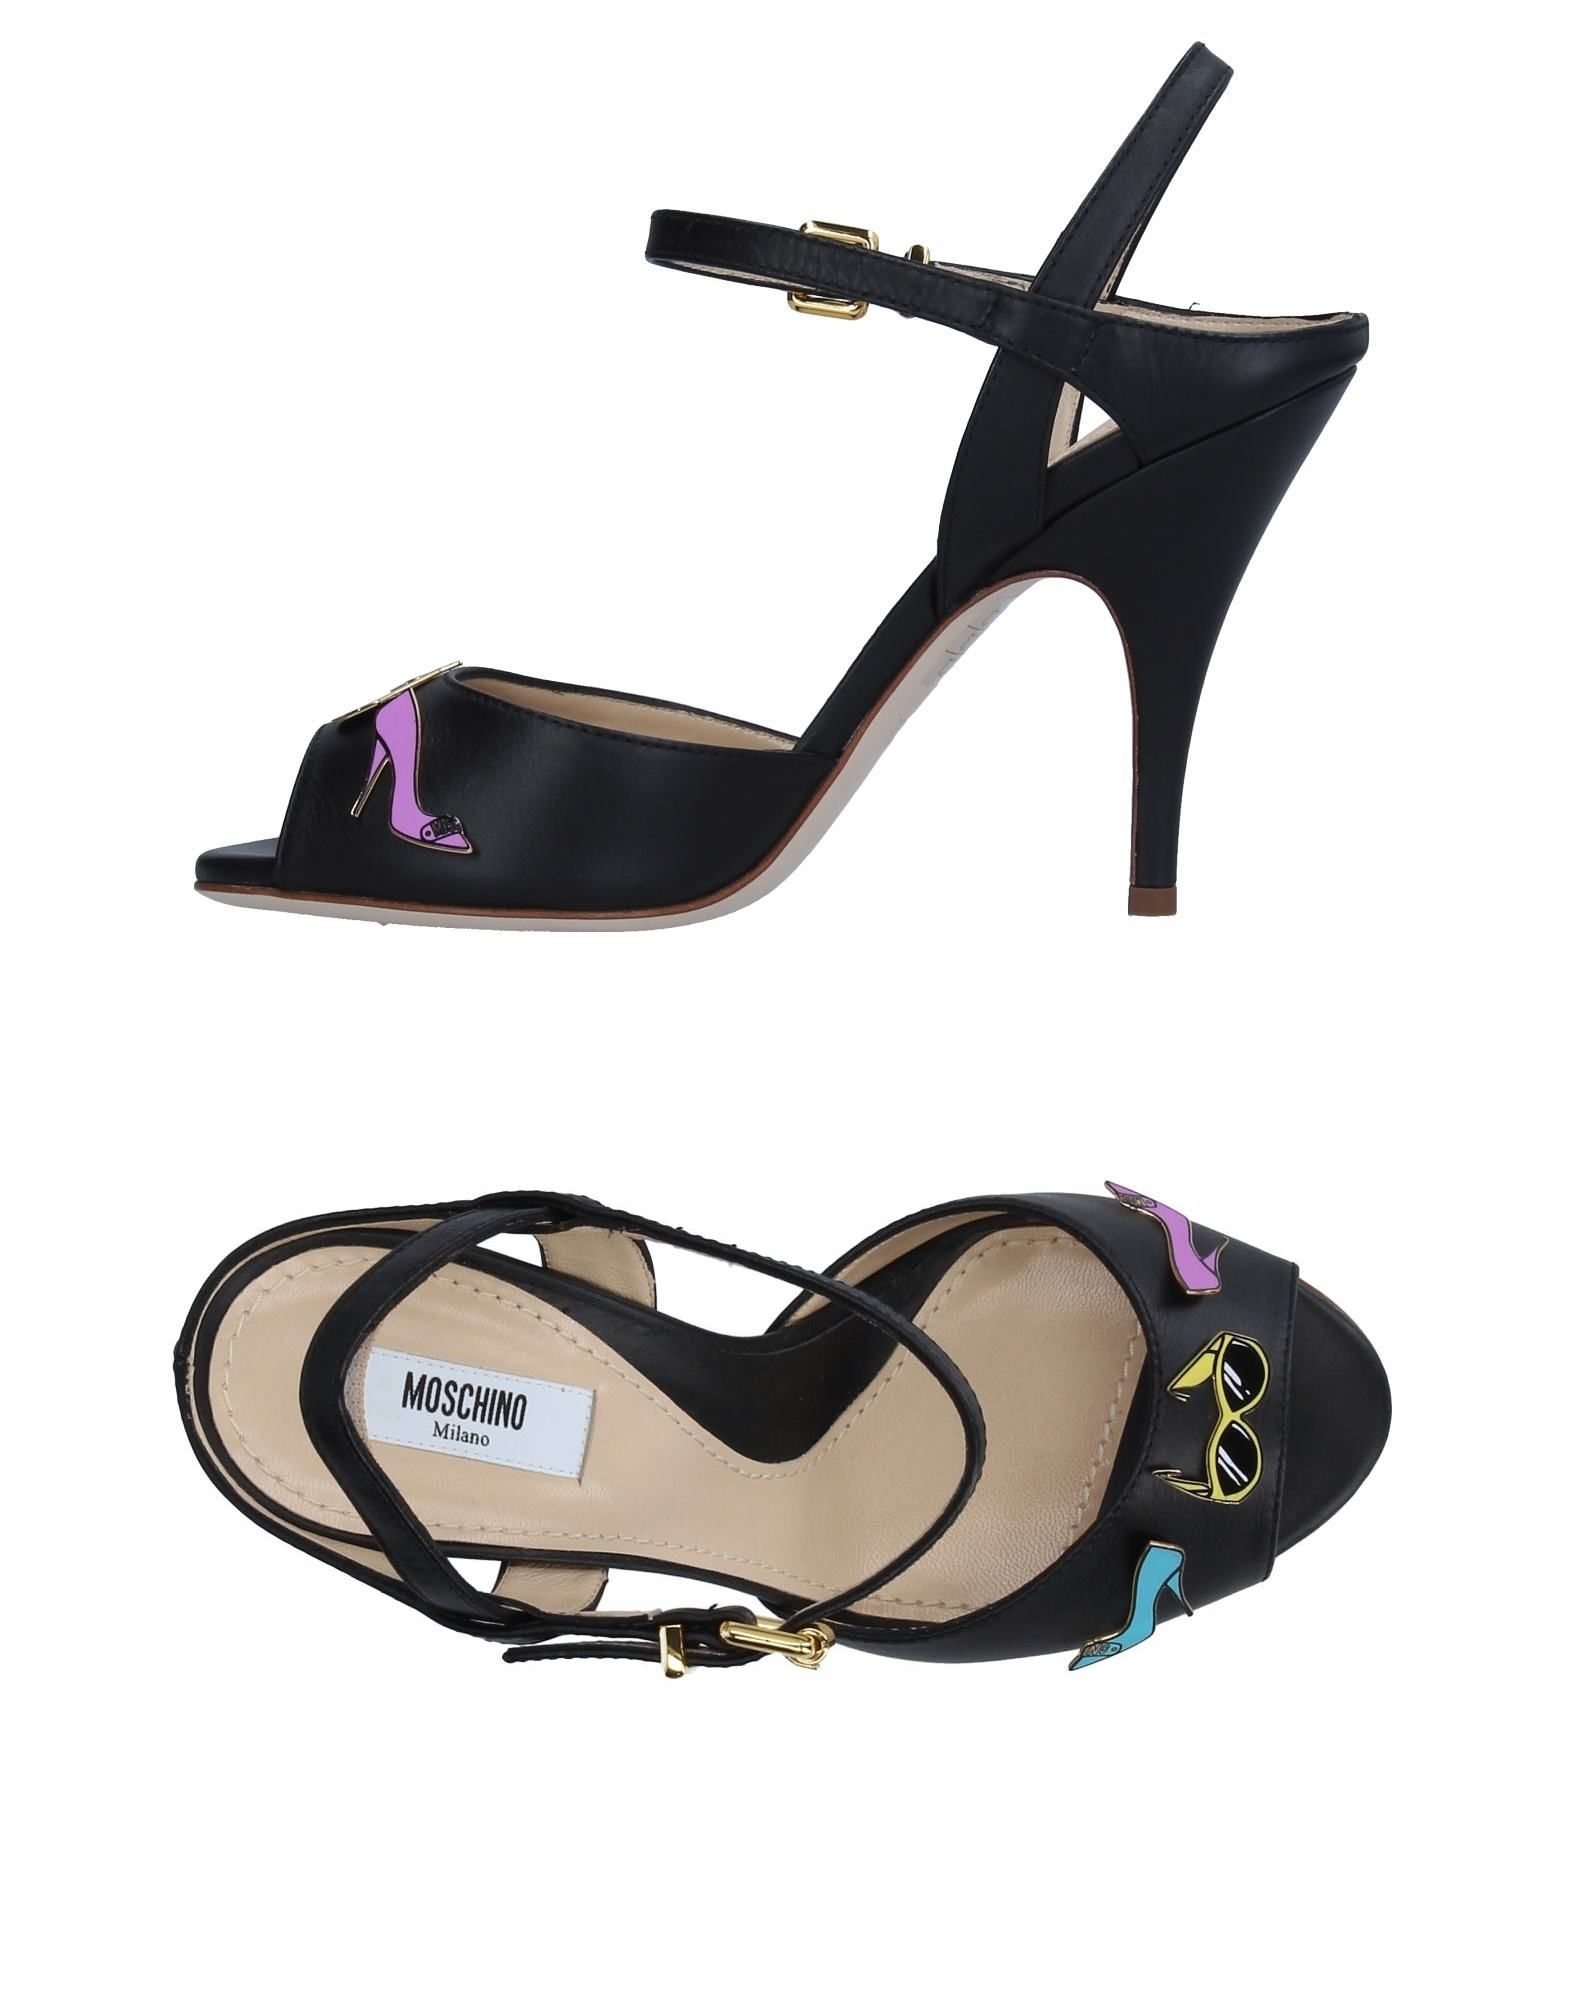 Moda Sandali Moschino Donna Donna Moschino - 11326429JV 3dcb45